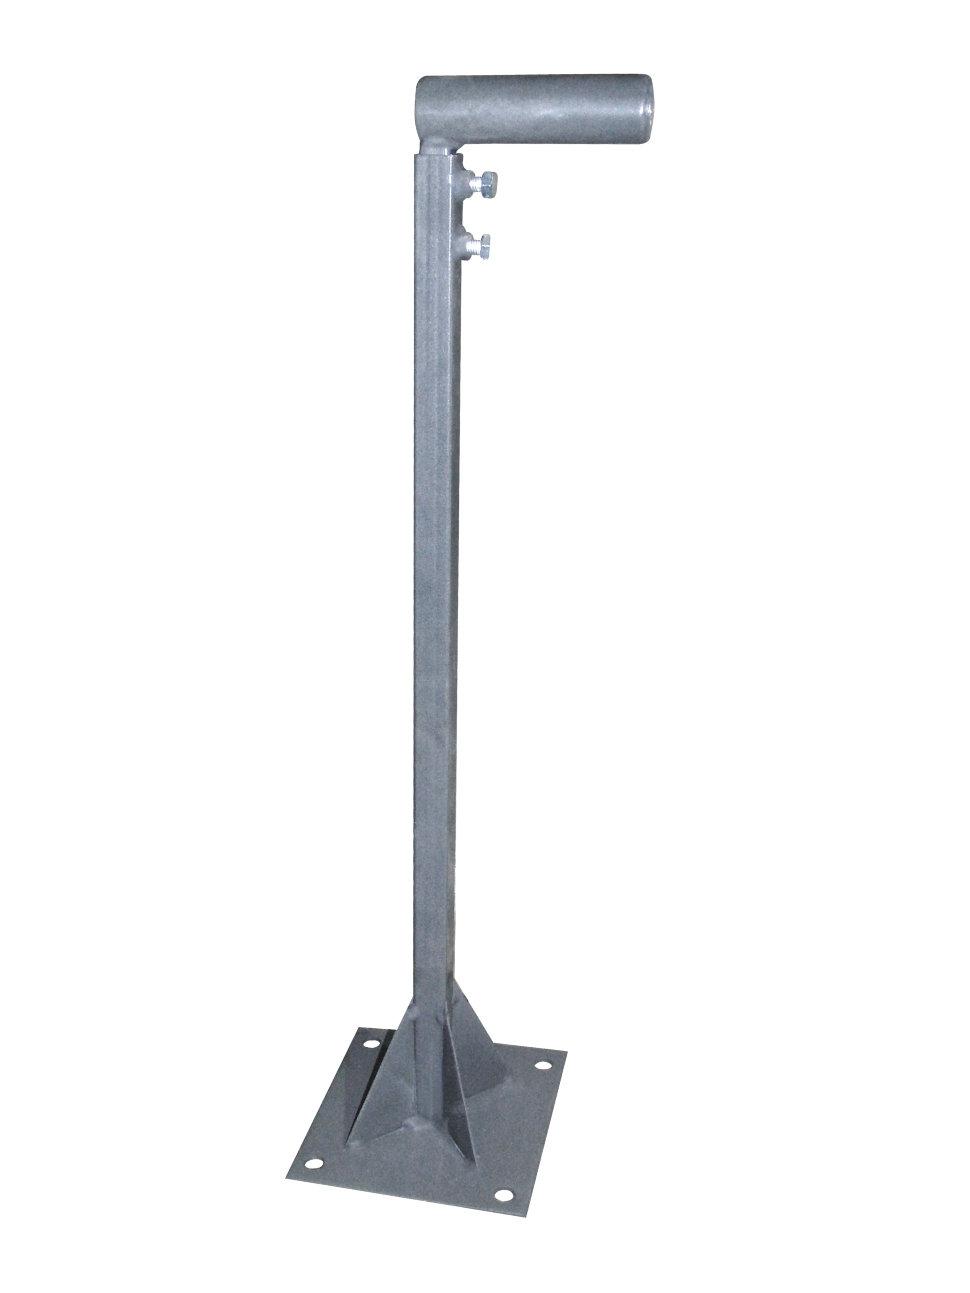 Кронштейн для TV антенн 60-110см телескопический Рексант 34-0582